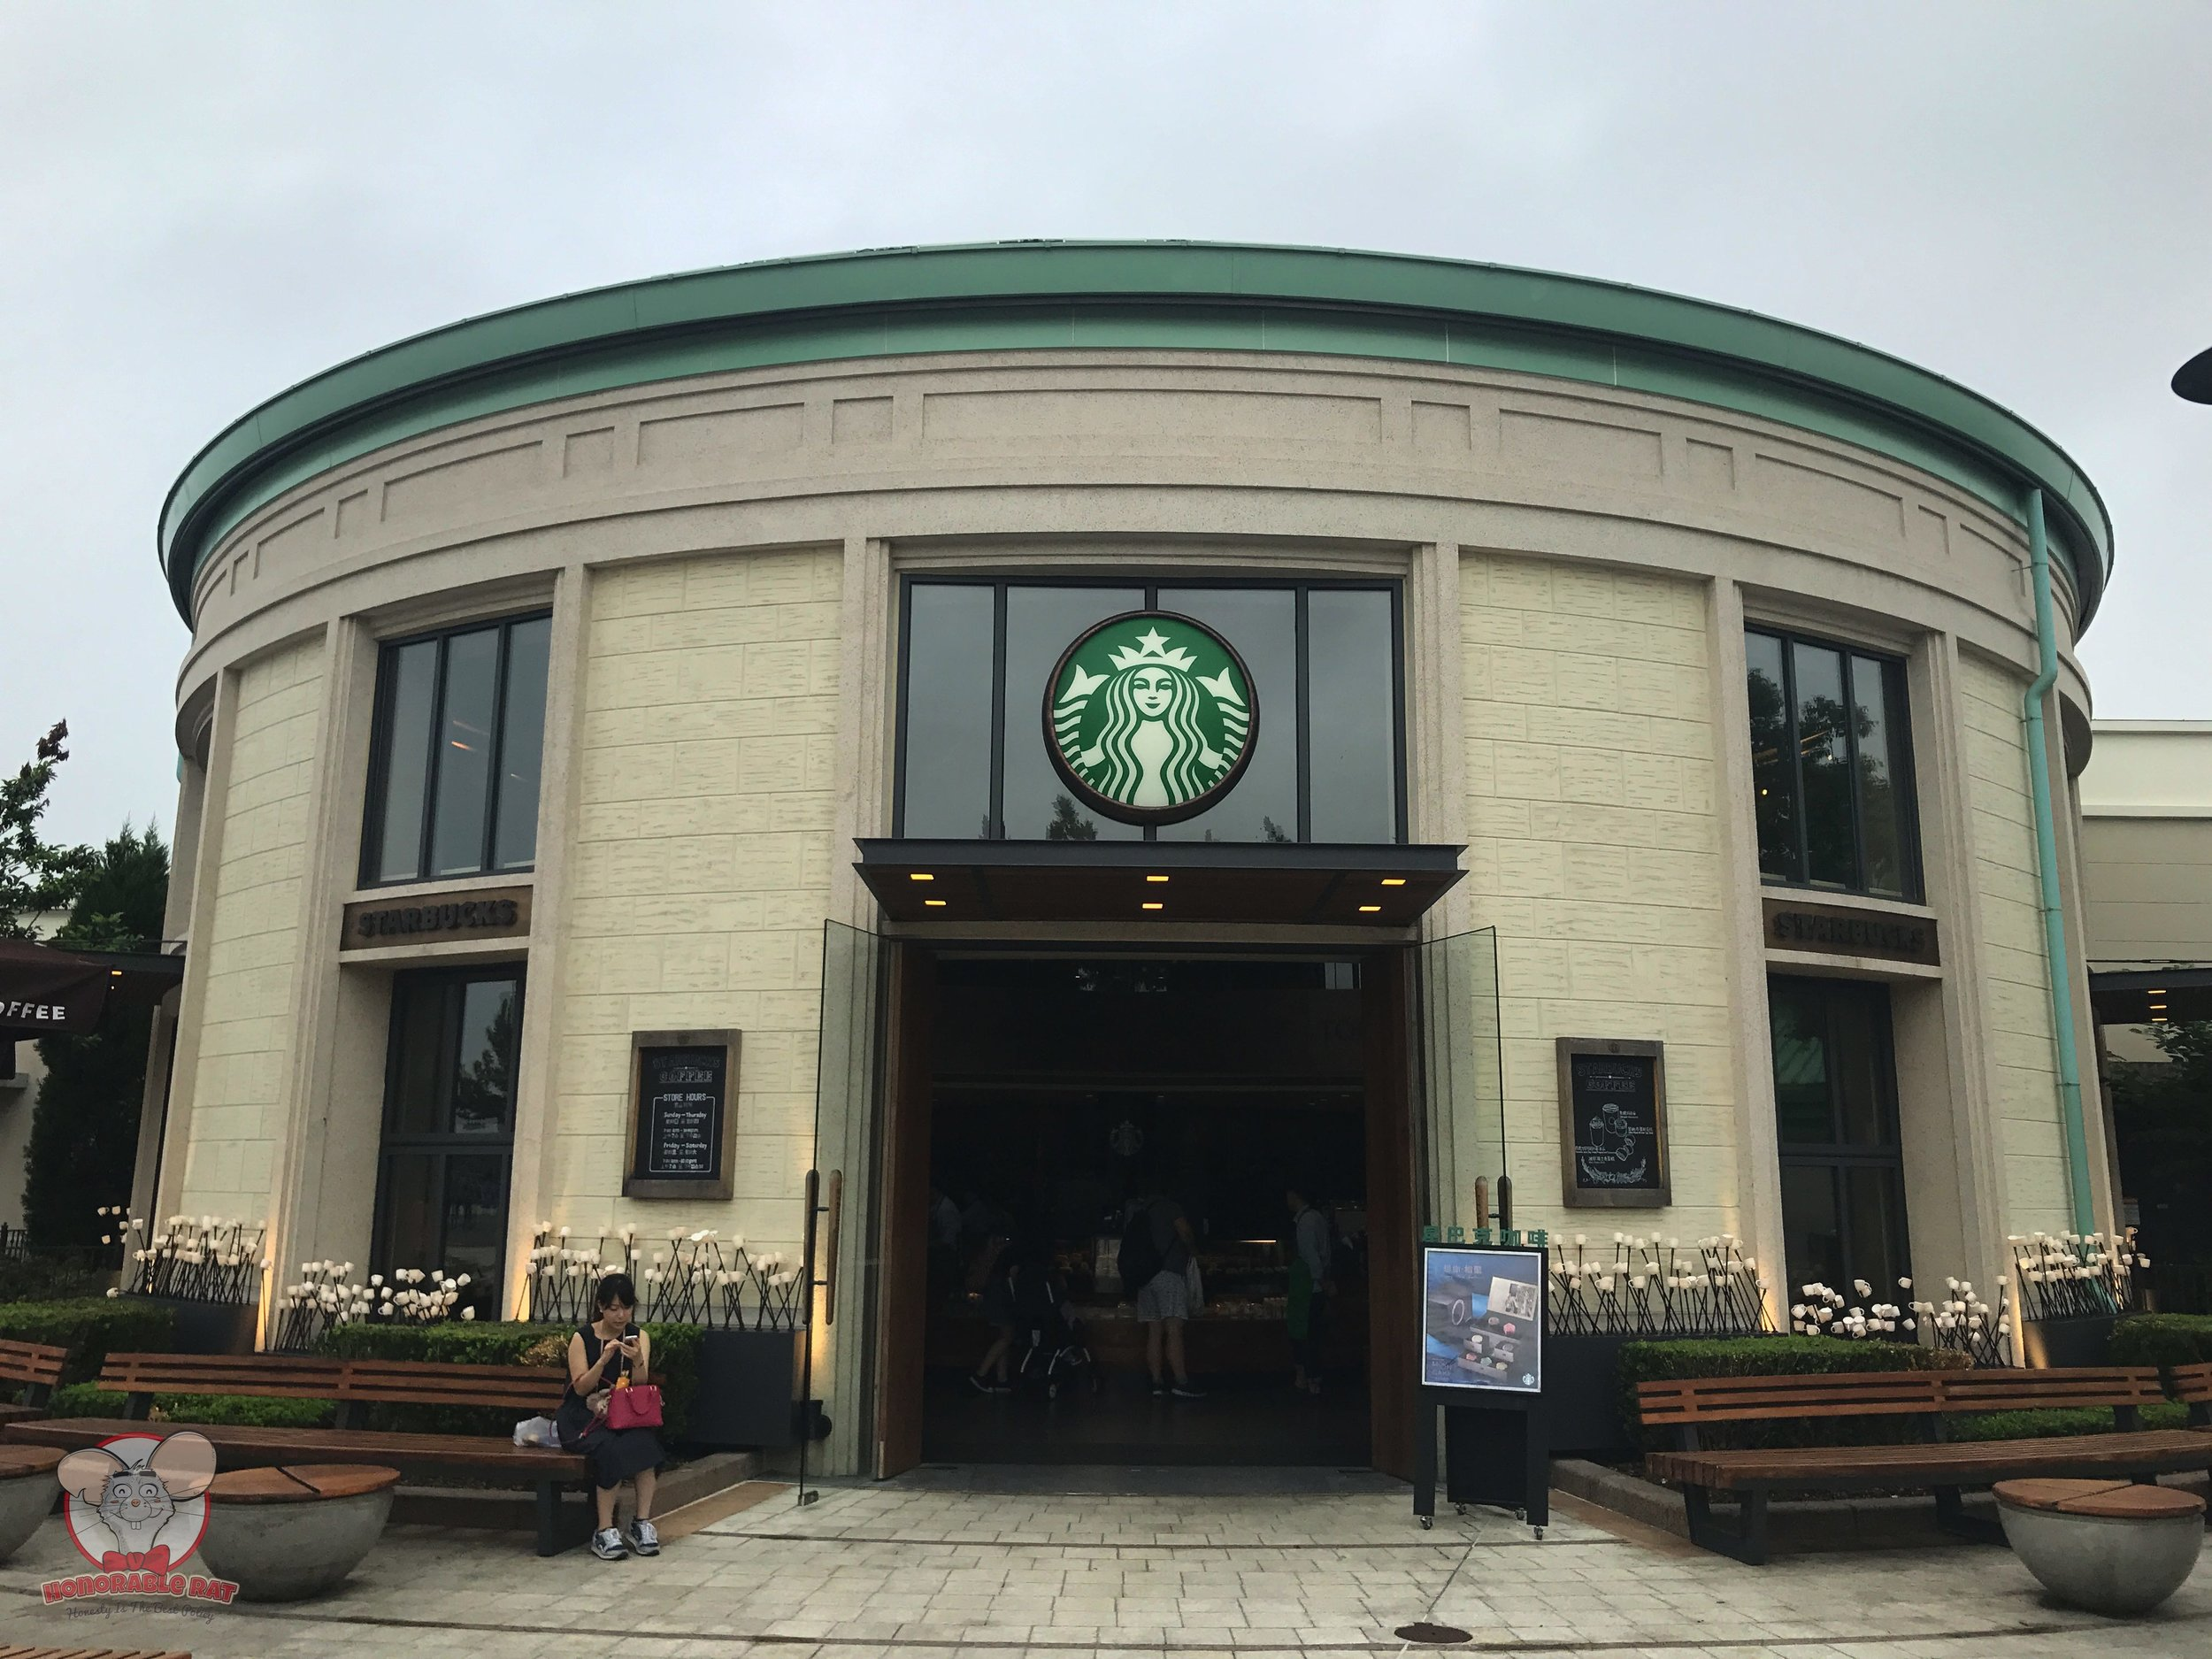 Starbucks in Shanghai Disneytown